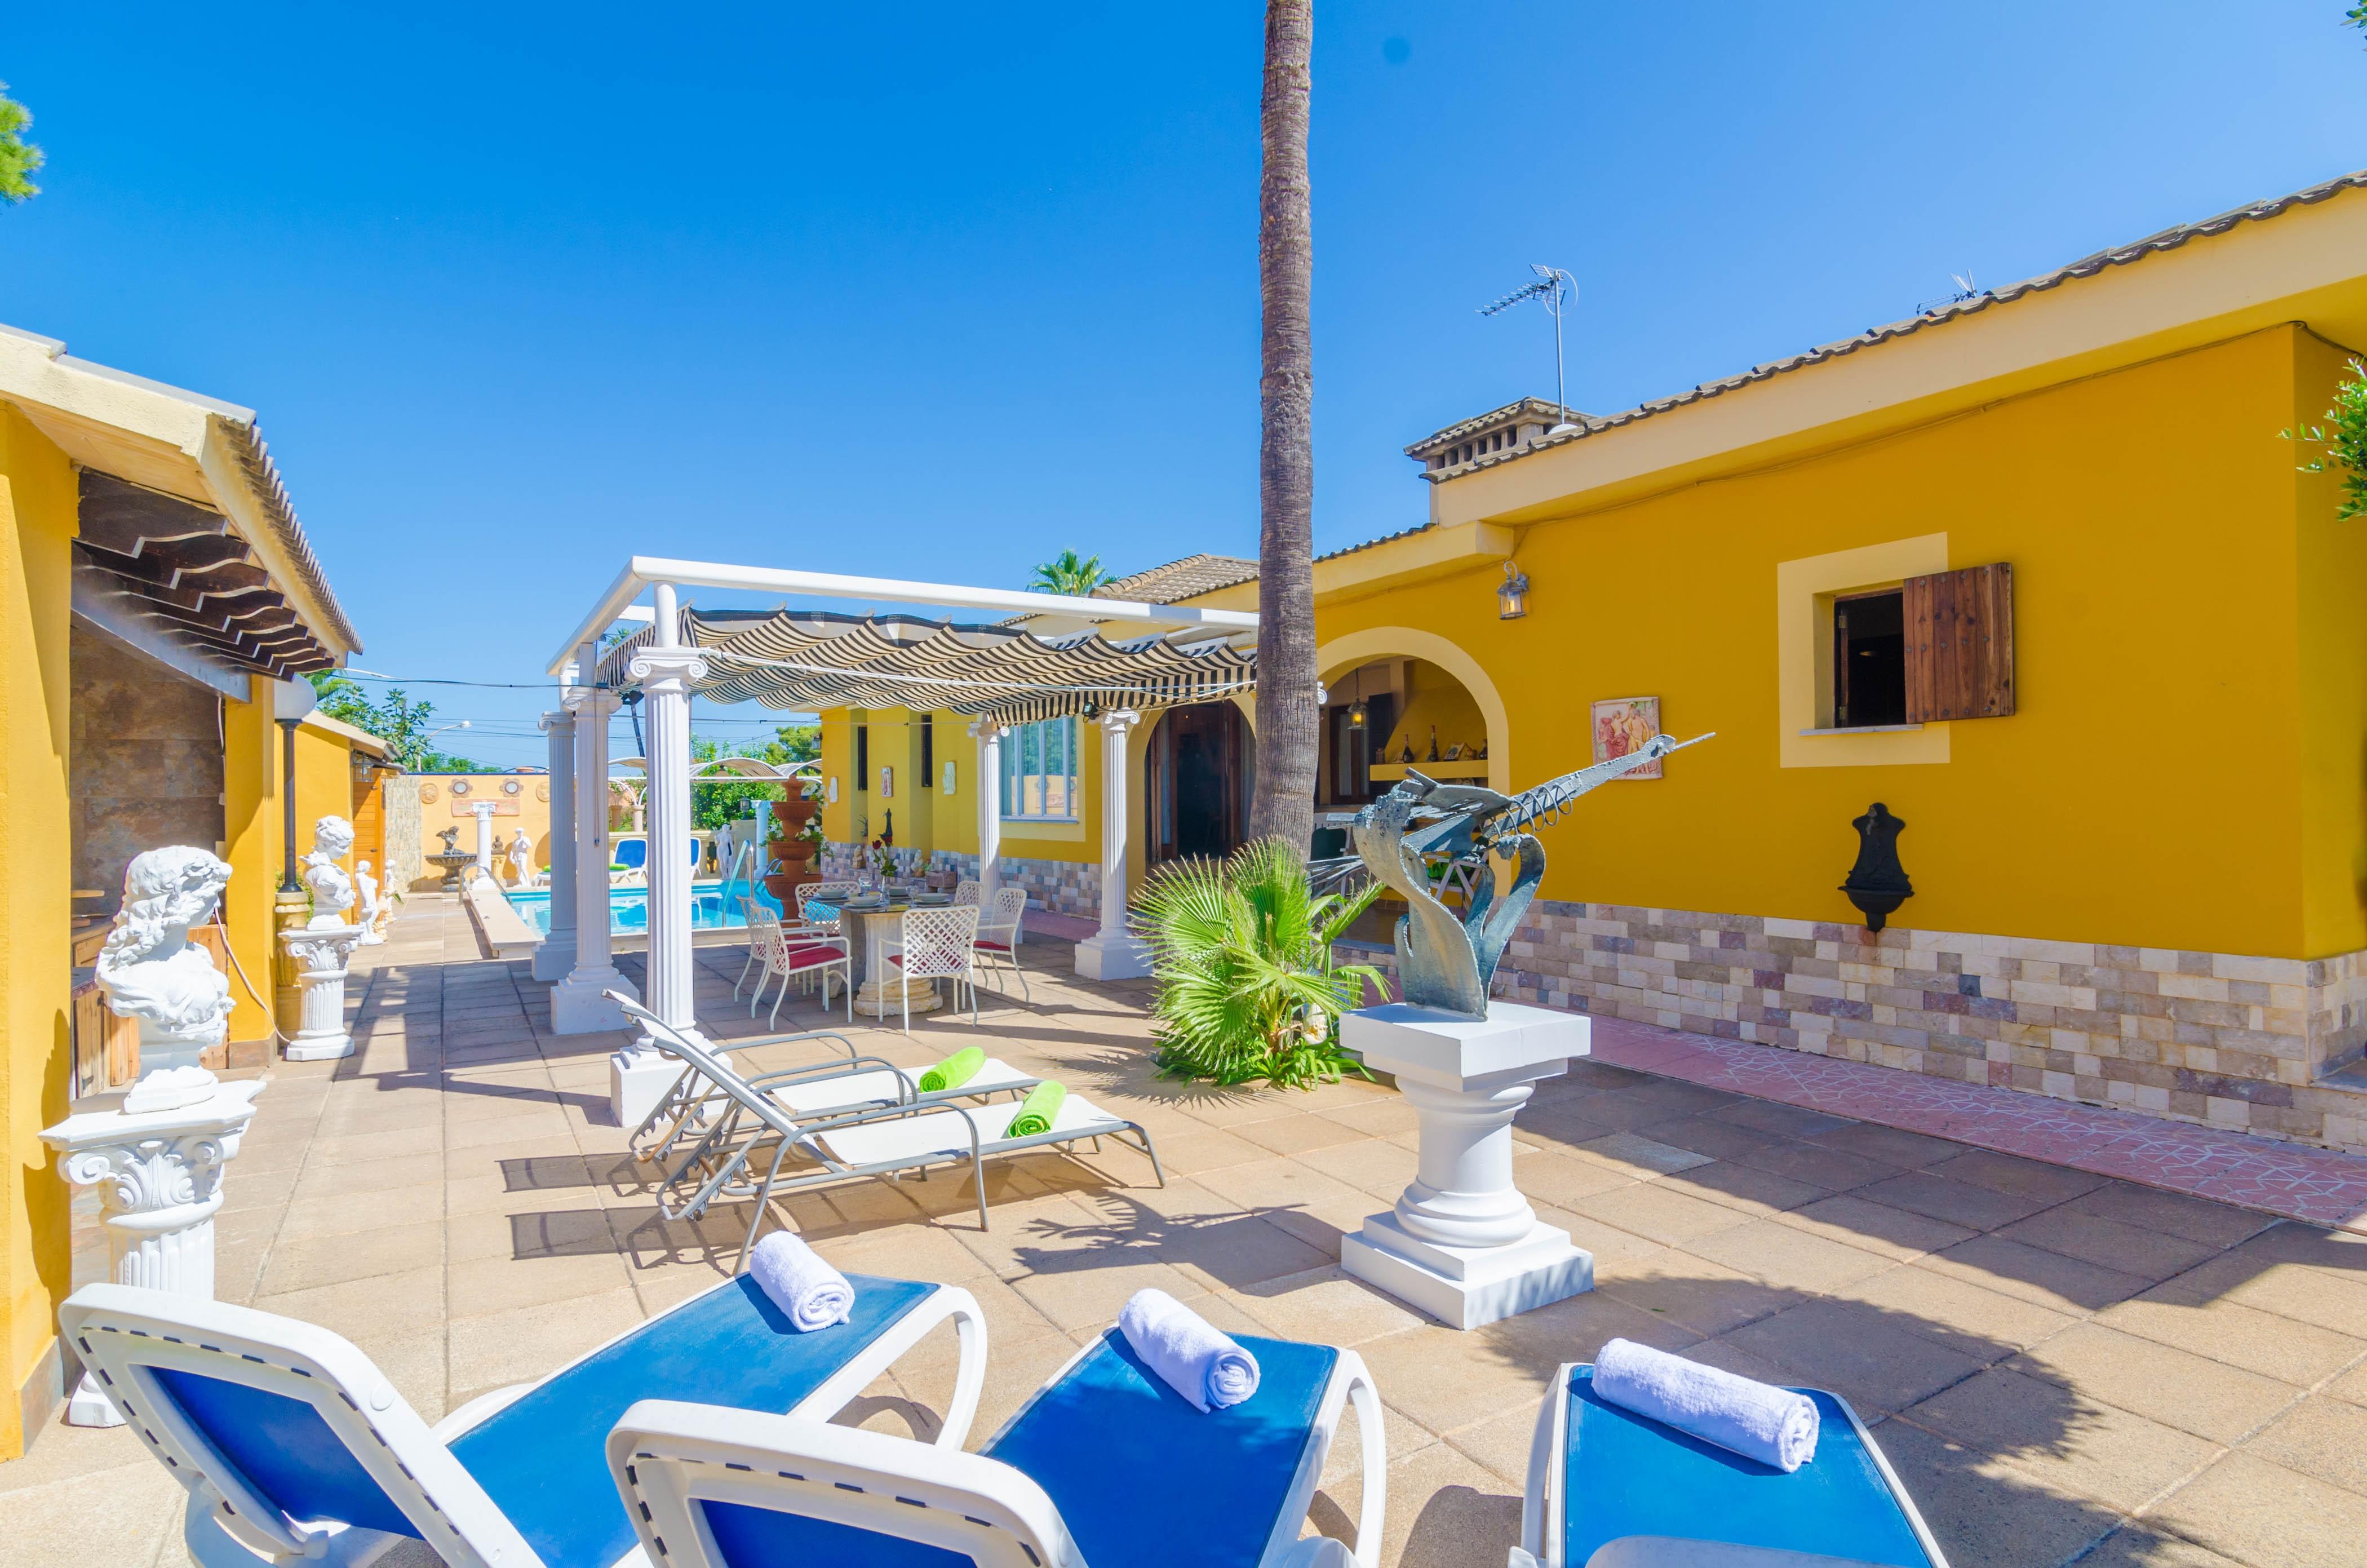 Ferienhaus CAN GORI (2296828), Badia Gran, Mallorca, Balearische Inseln, Spanien, Bild 29